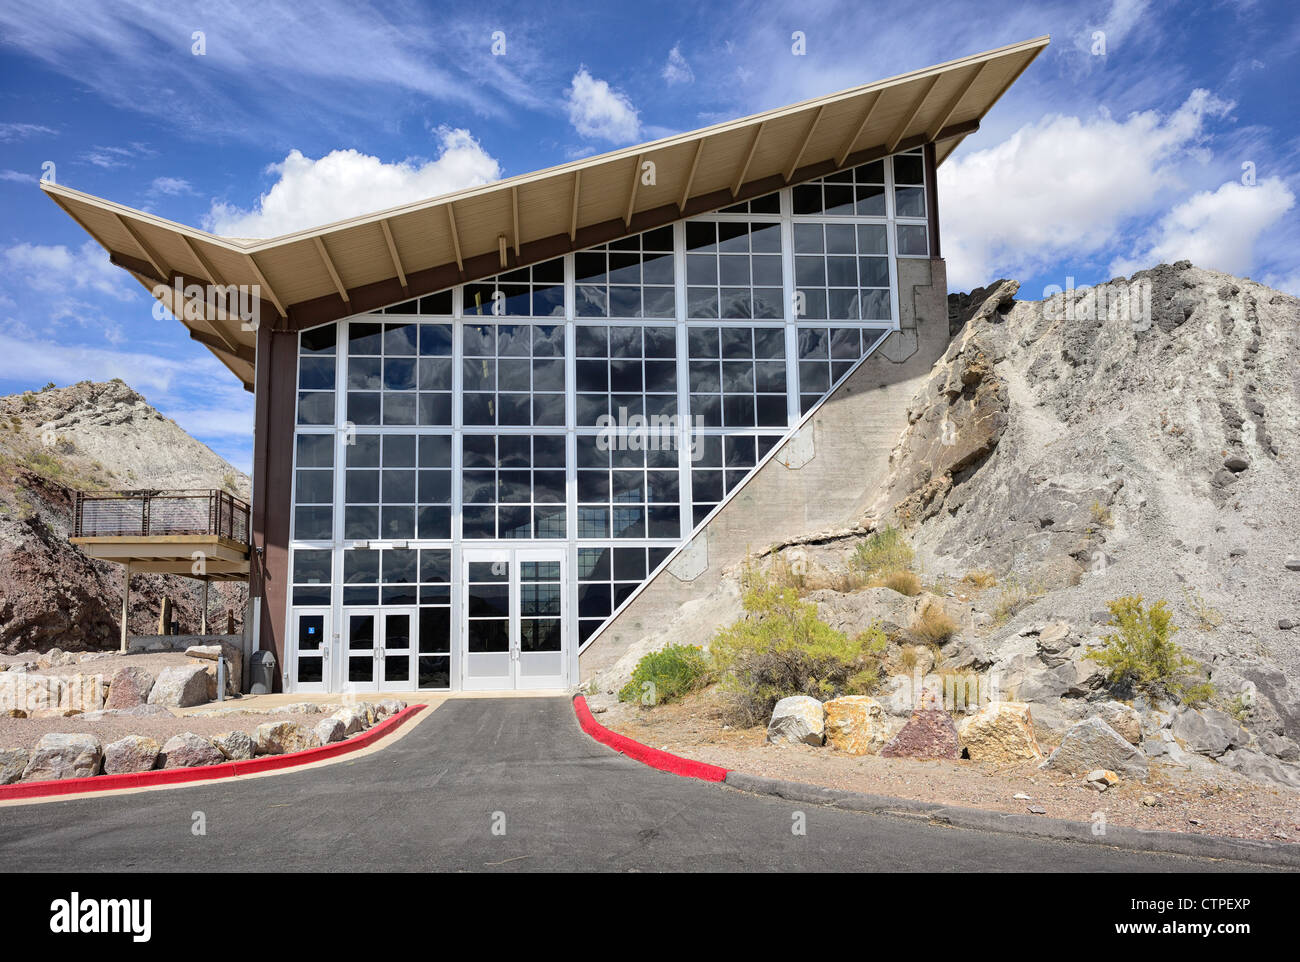 Dinosaur Quarry Fossil Wall building, Dinosaur National Monument, Utah, USA - Stock Image